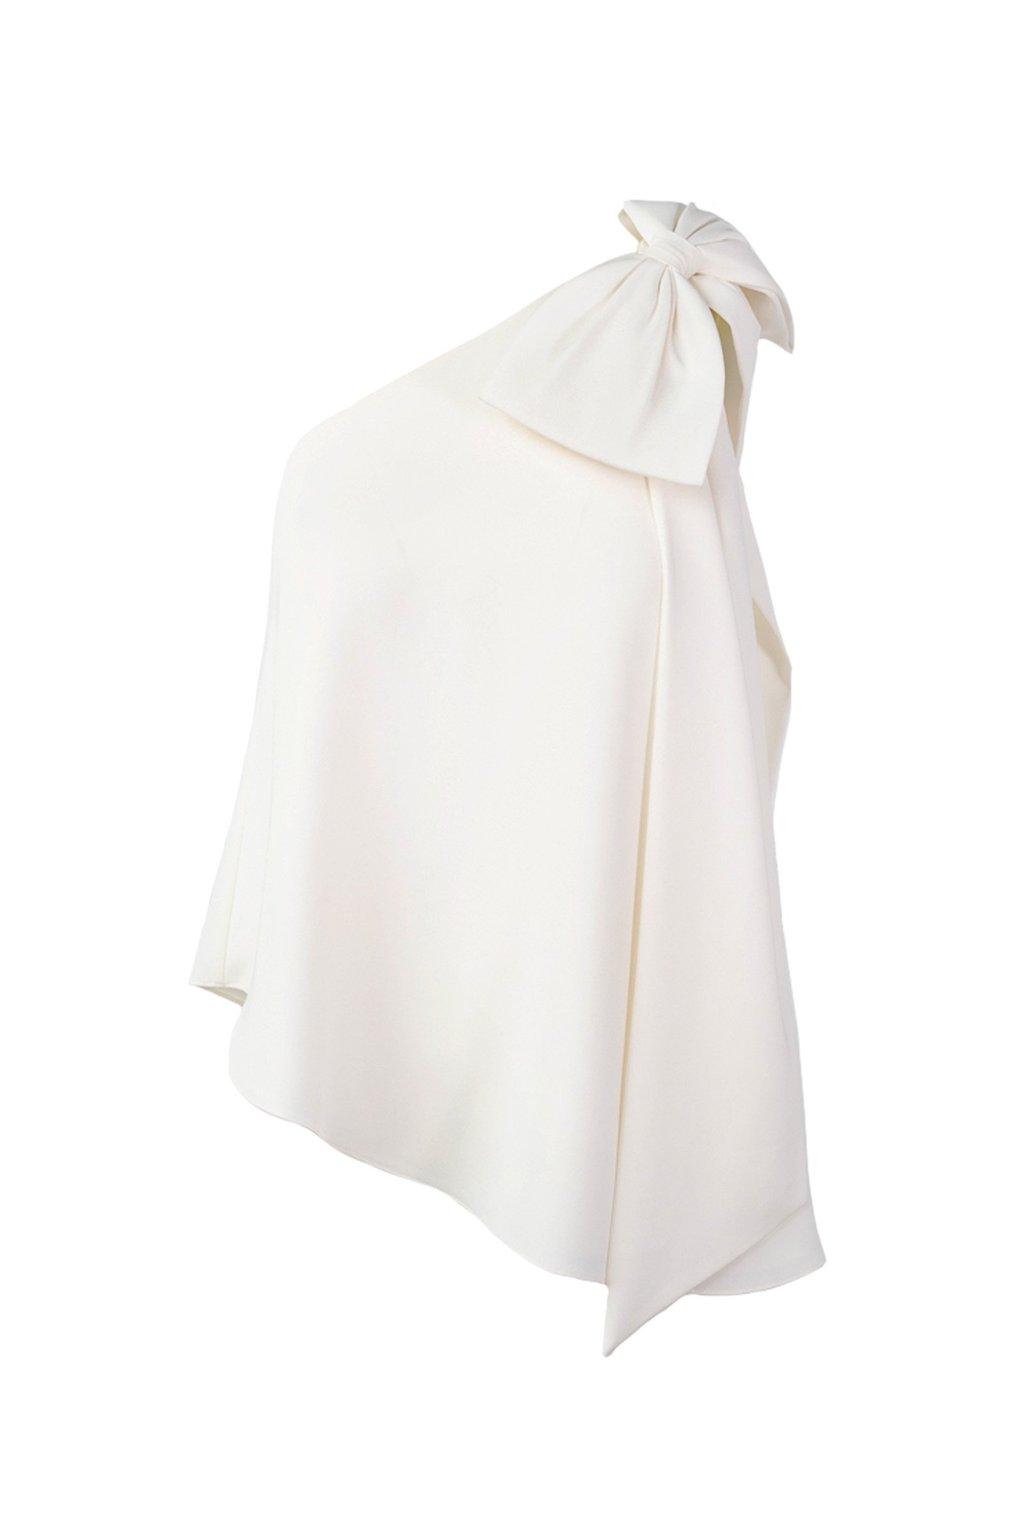 White Wanda Top by J.ING women's clothing